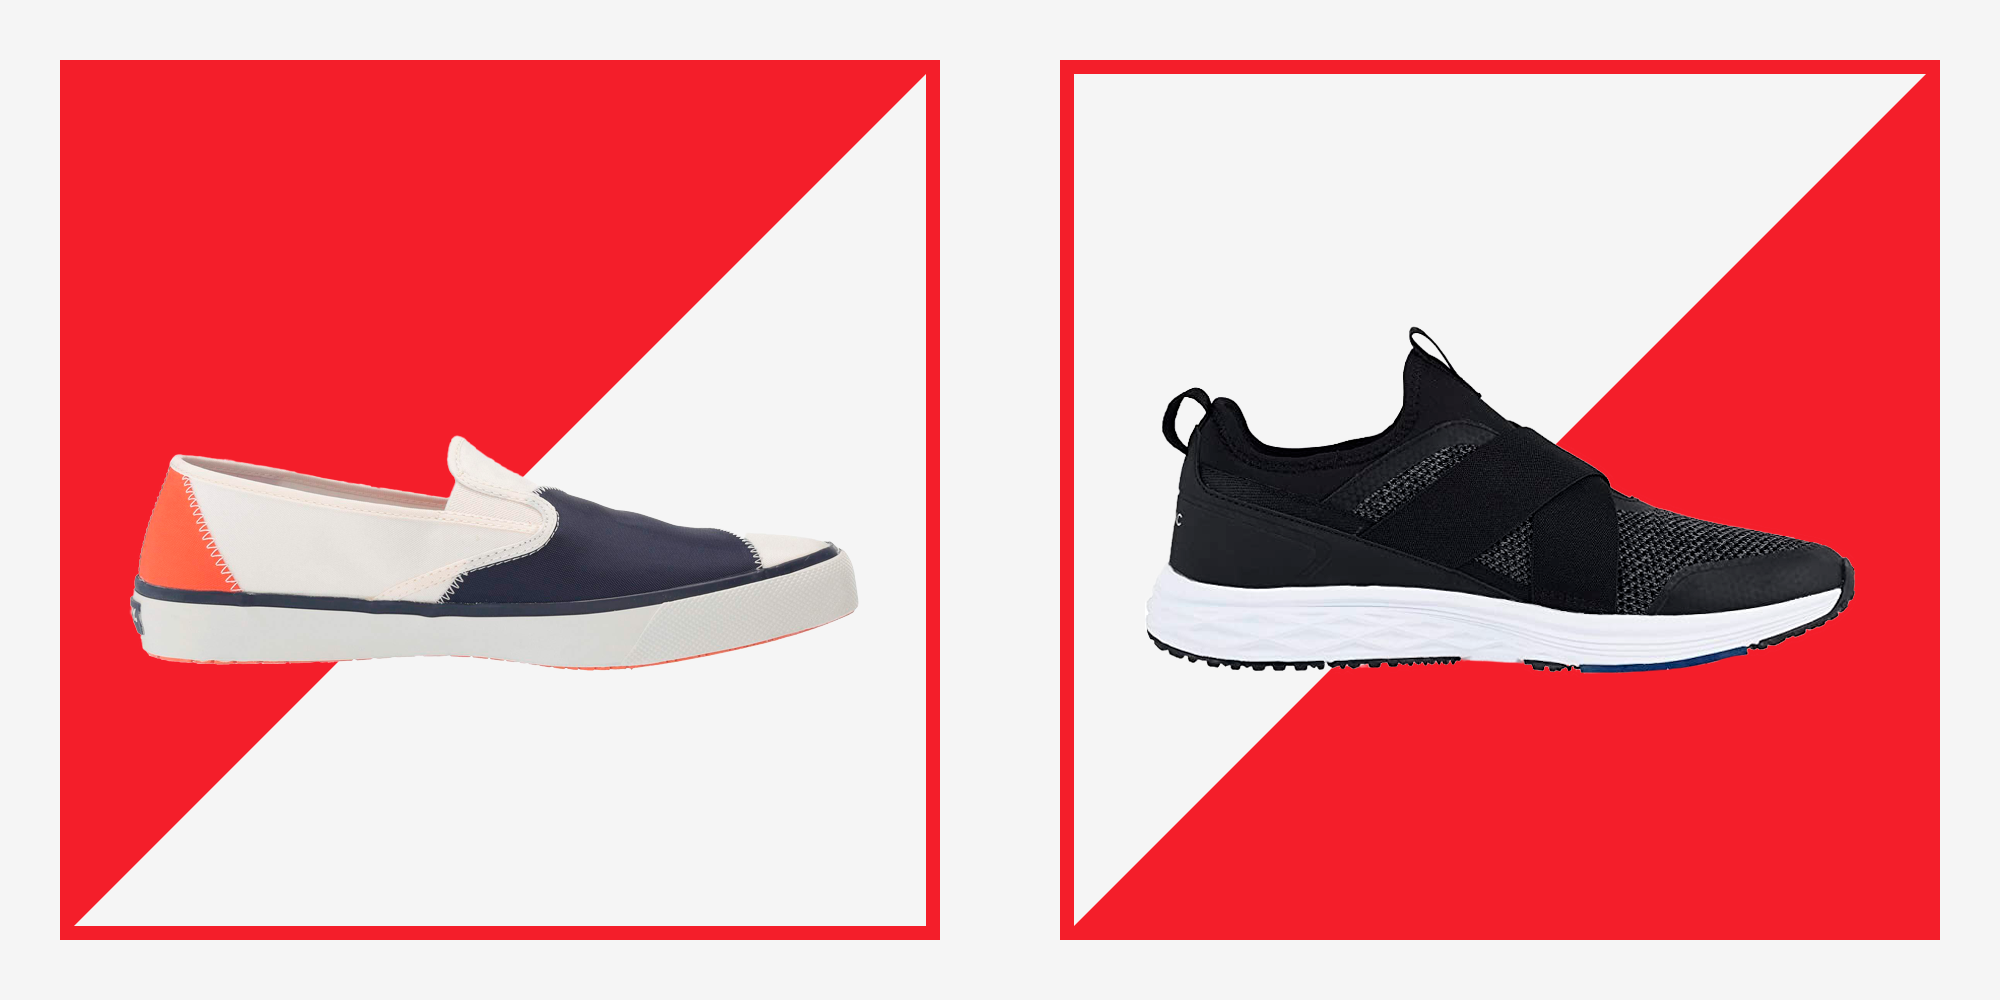 comfy slip on shoes